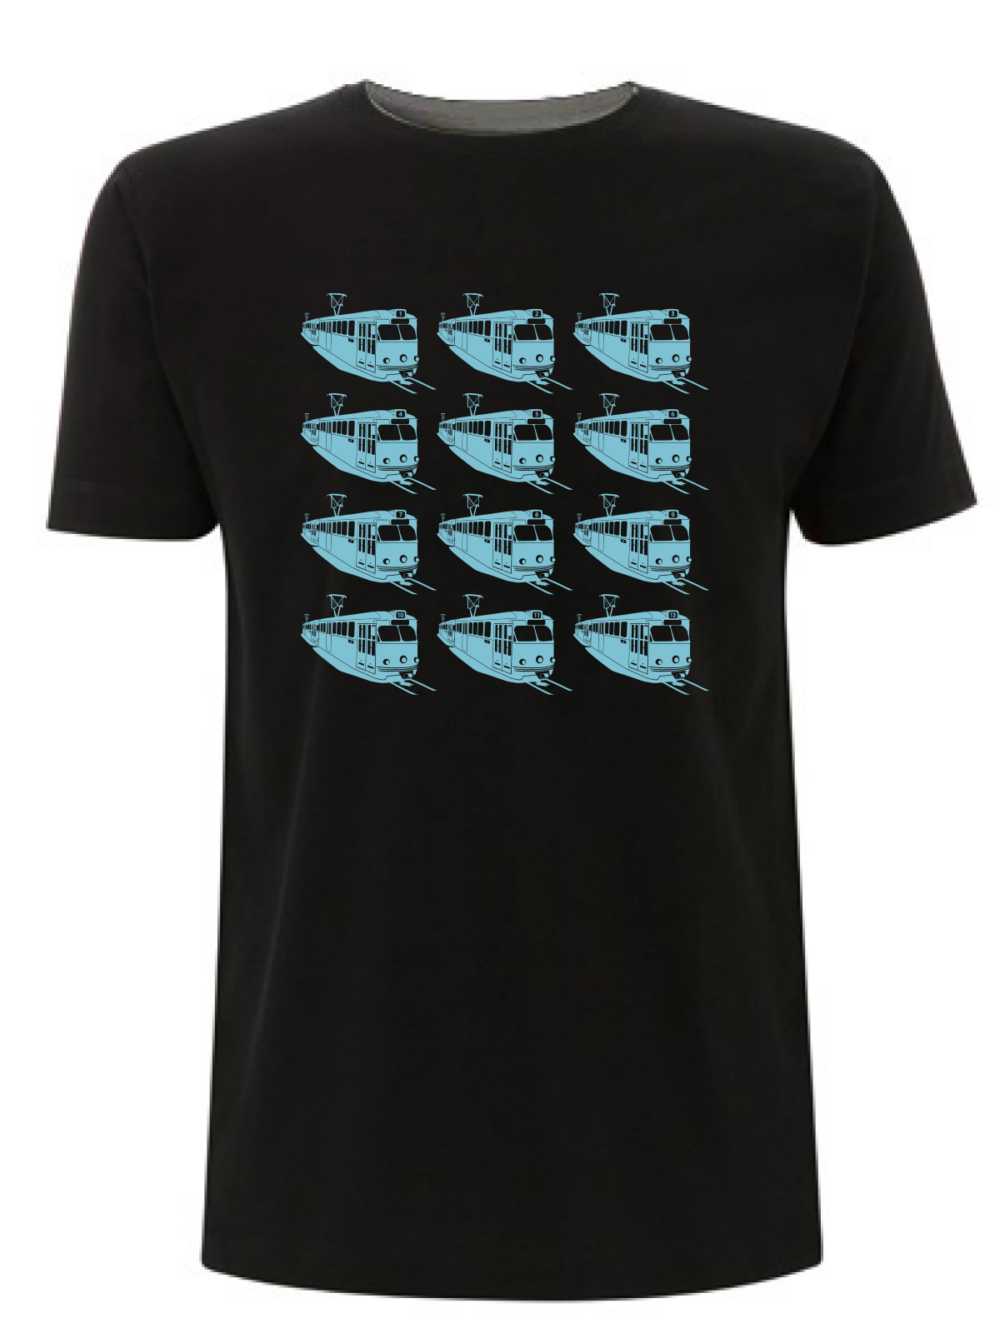 Gothenburg tramway T-shirt